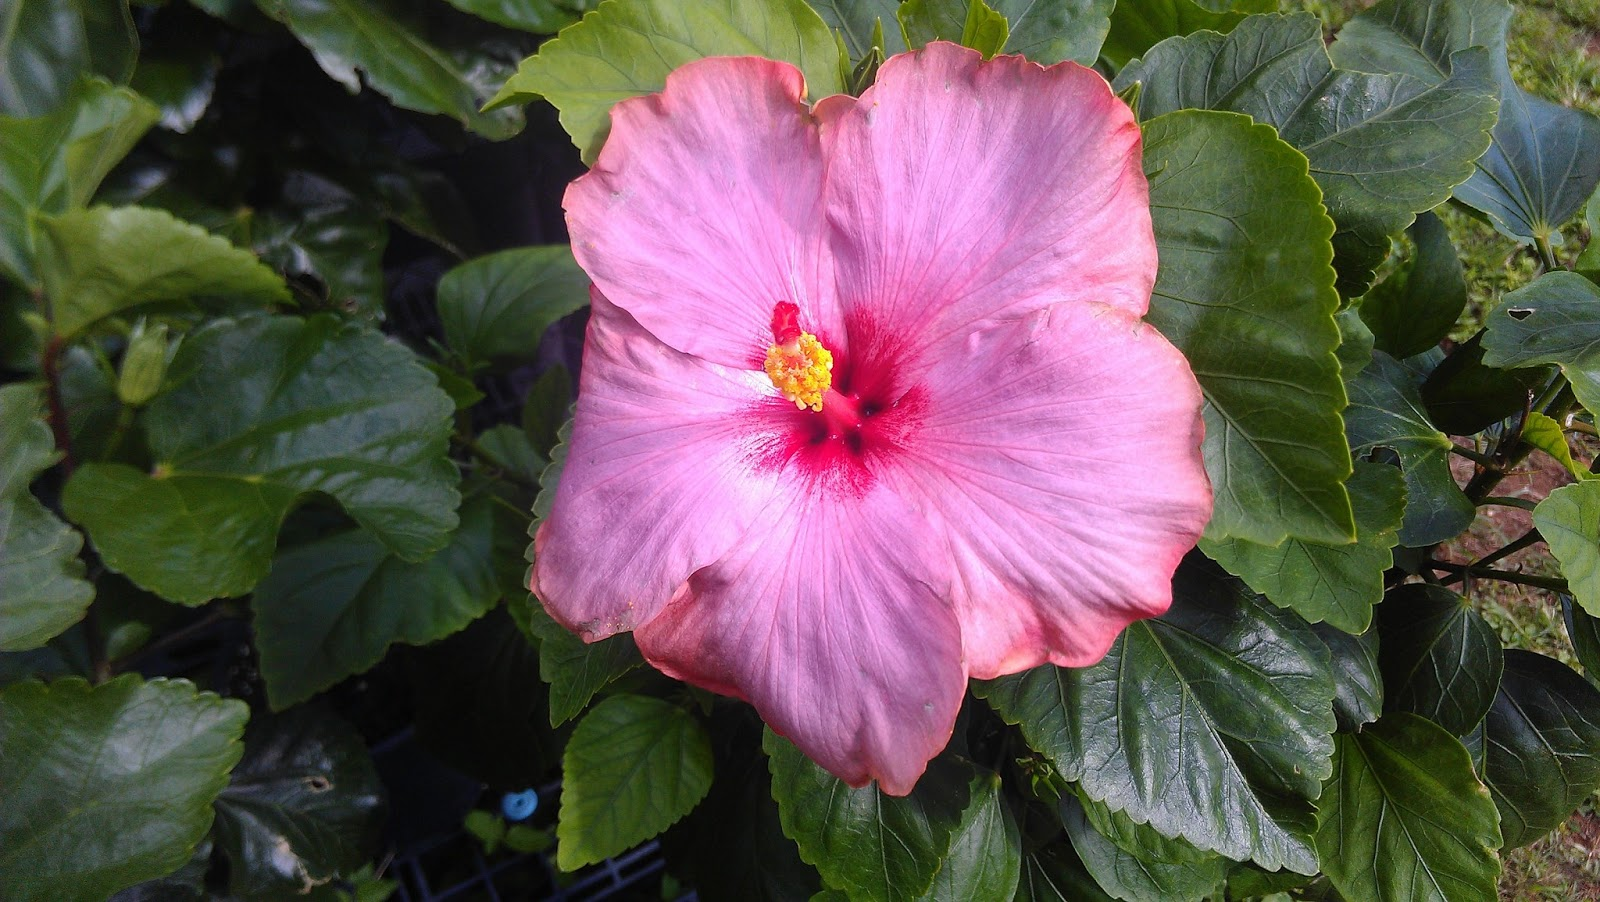 Kapu gardens hibiscus hybrids for sale pinks purples izmirmasajfo